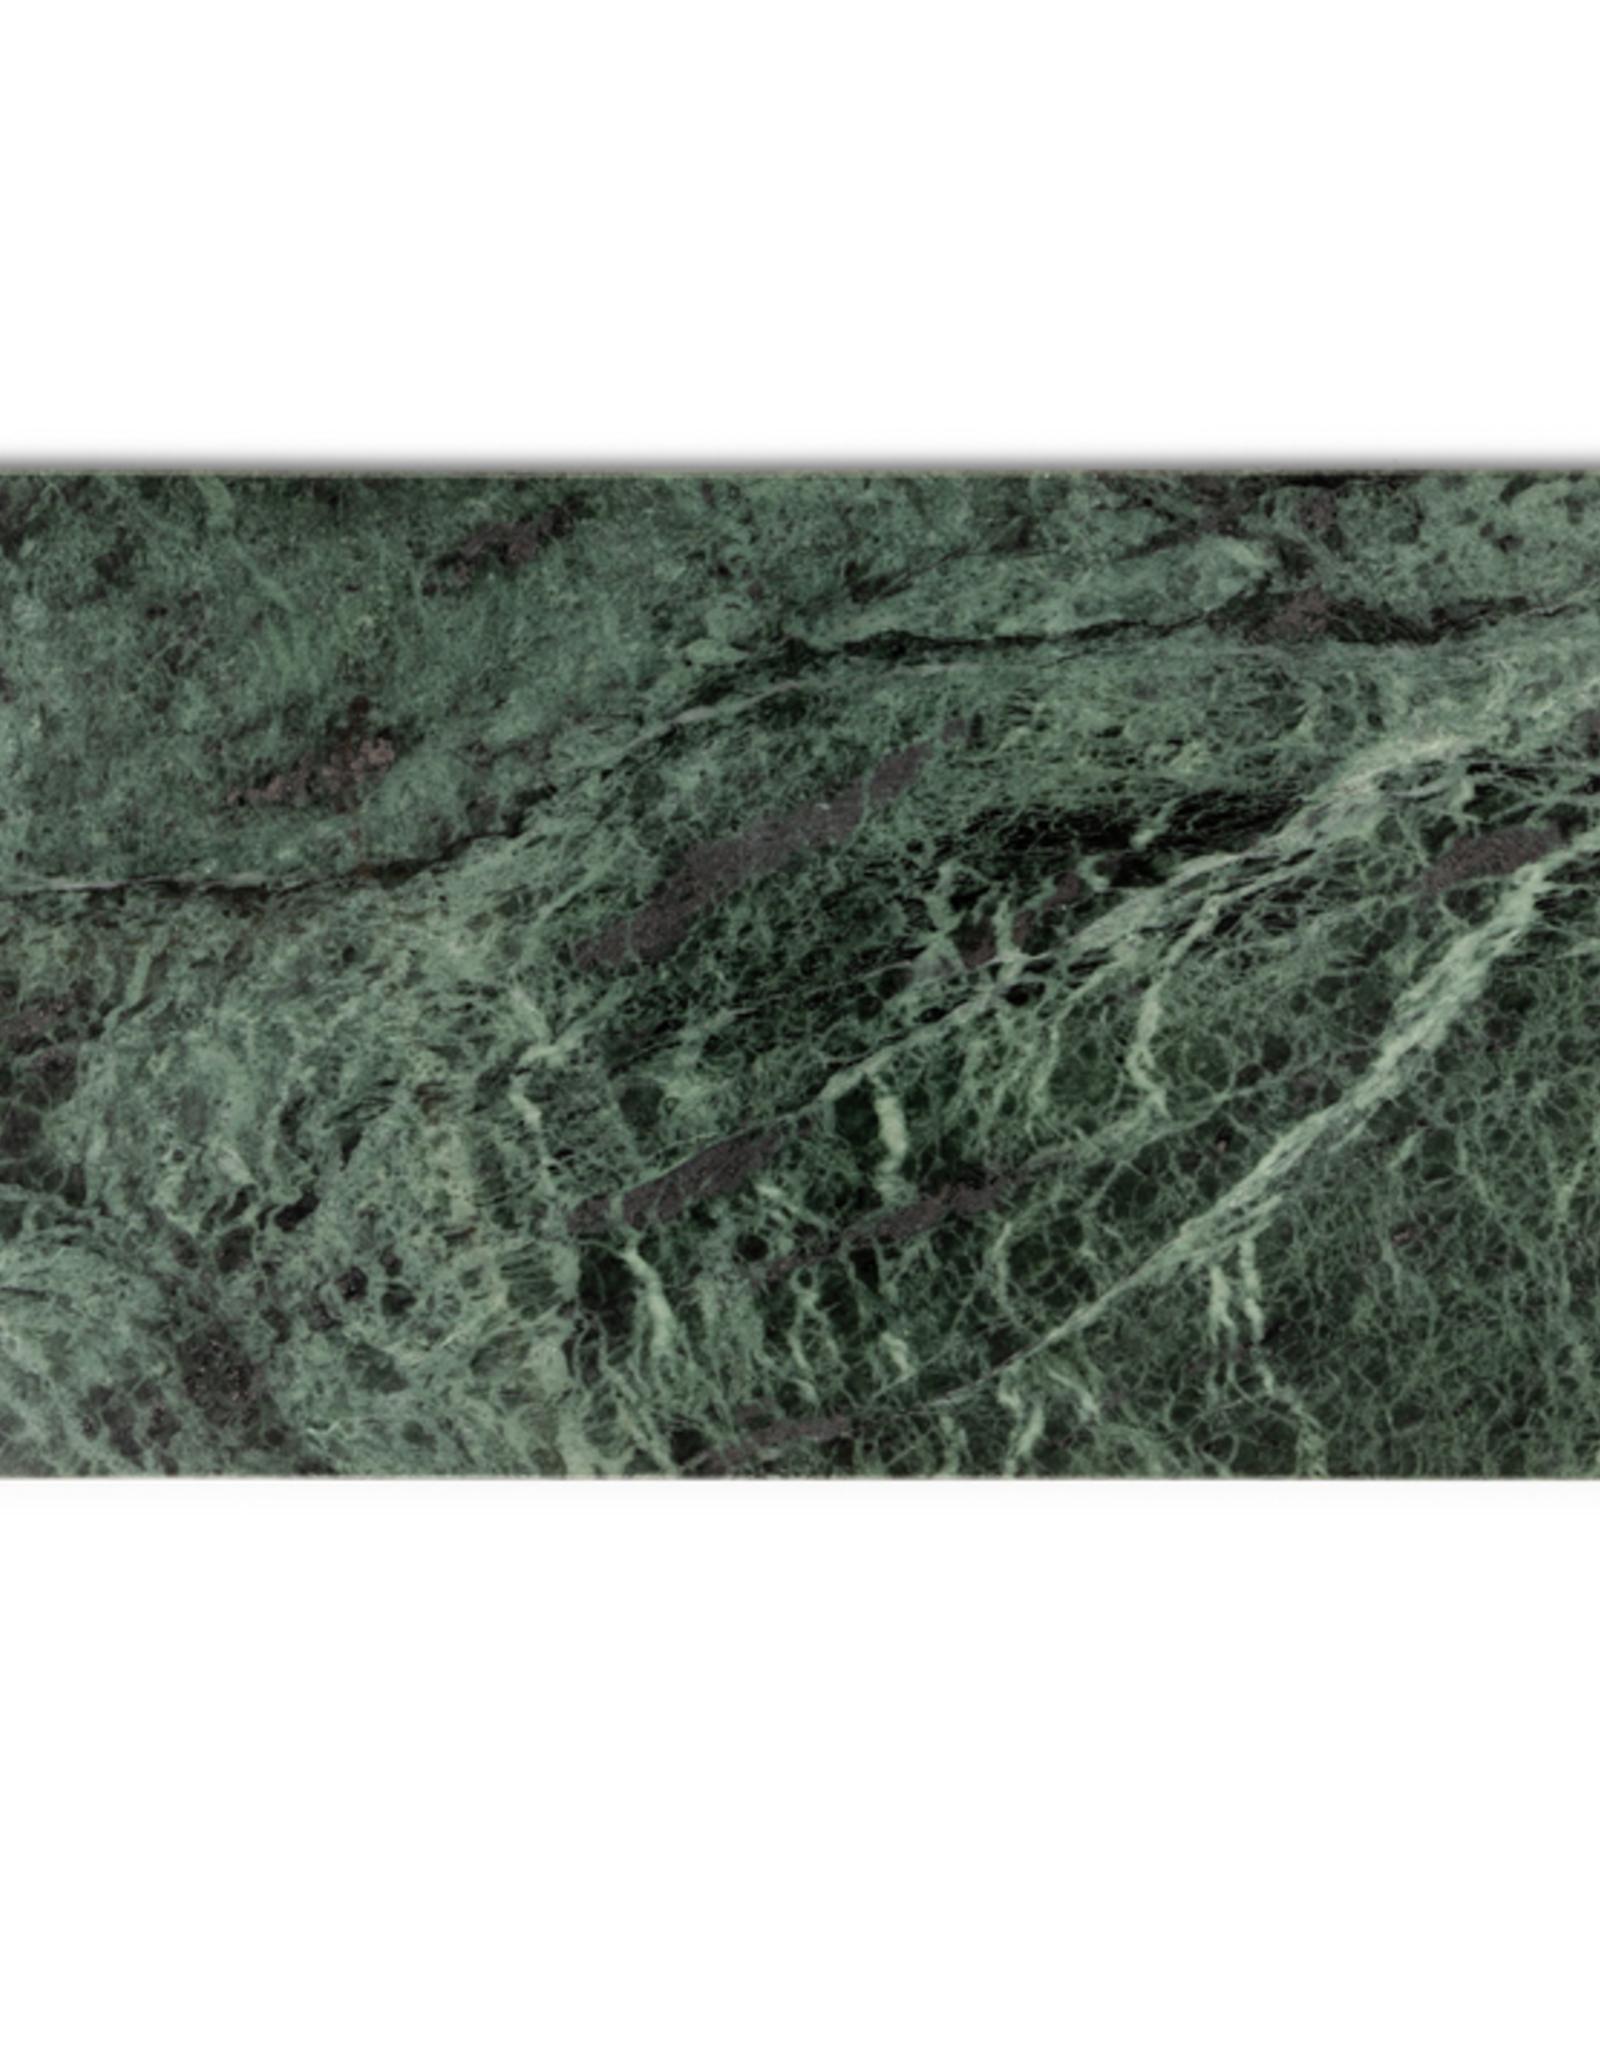 Stoned - Rectangular green board S